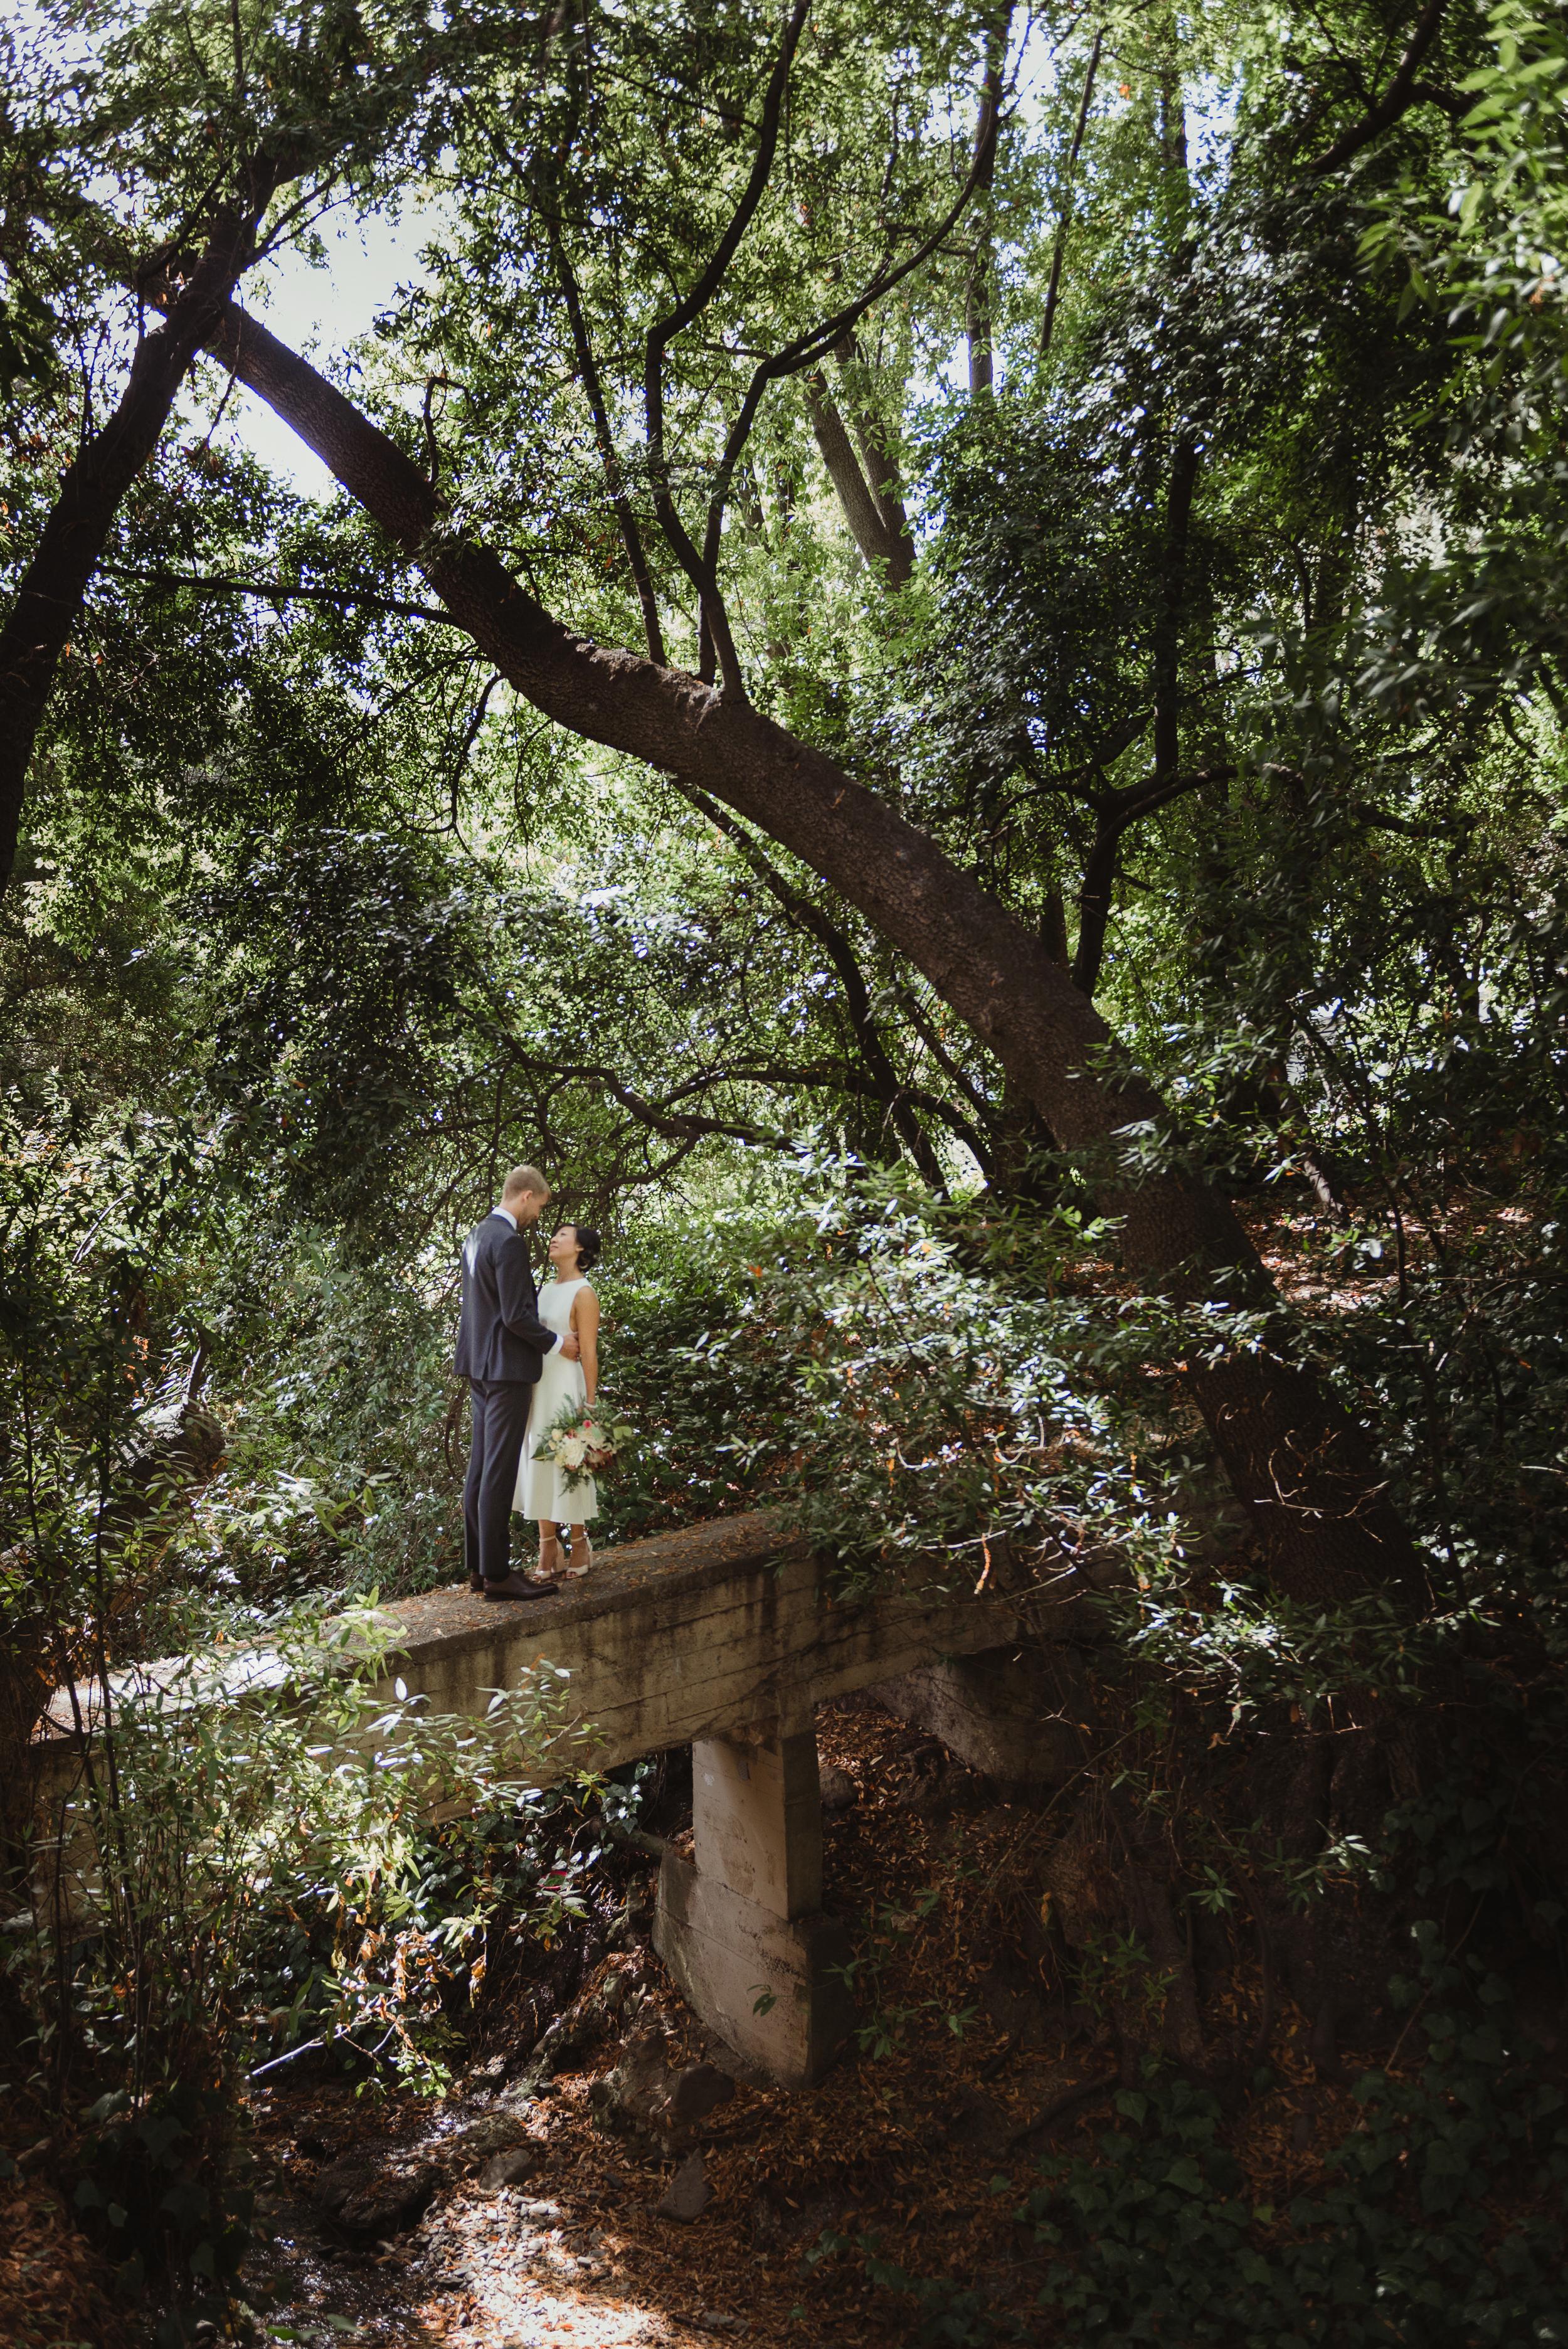 faculty-club-berkeley-wedding-photographer-vc046.jpg